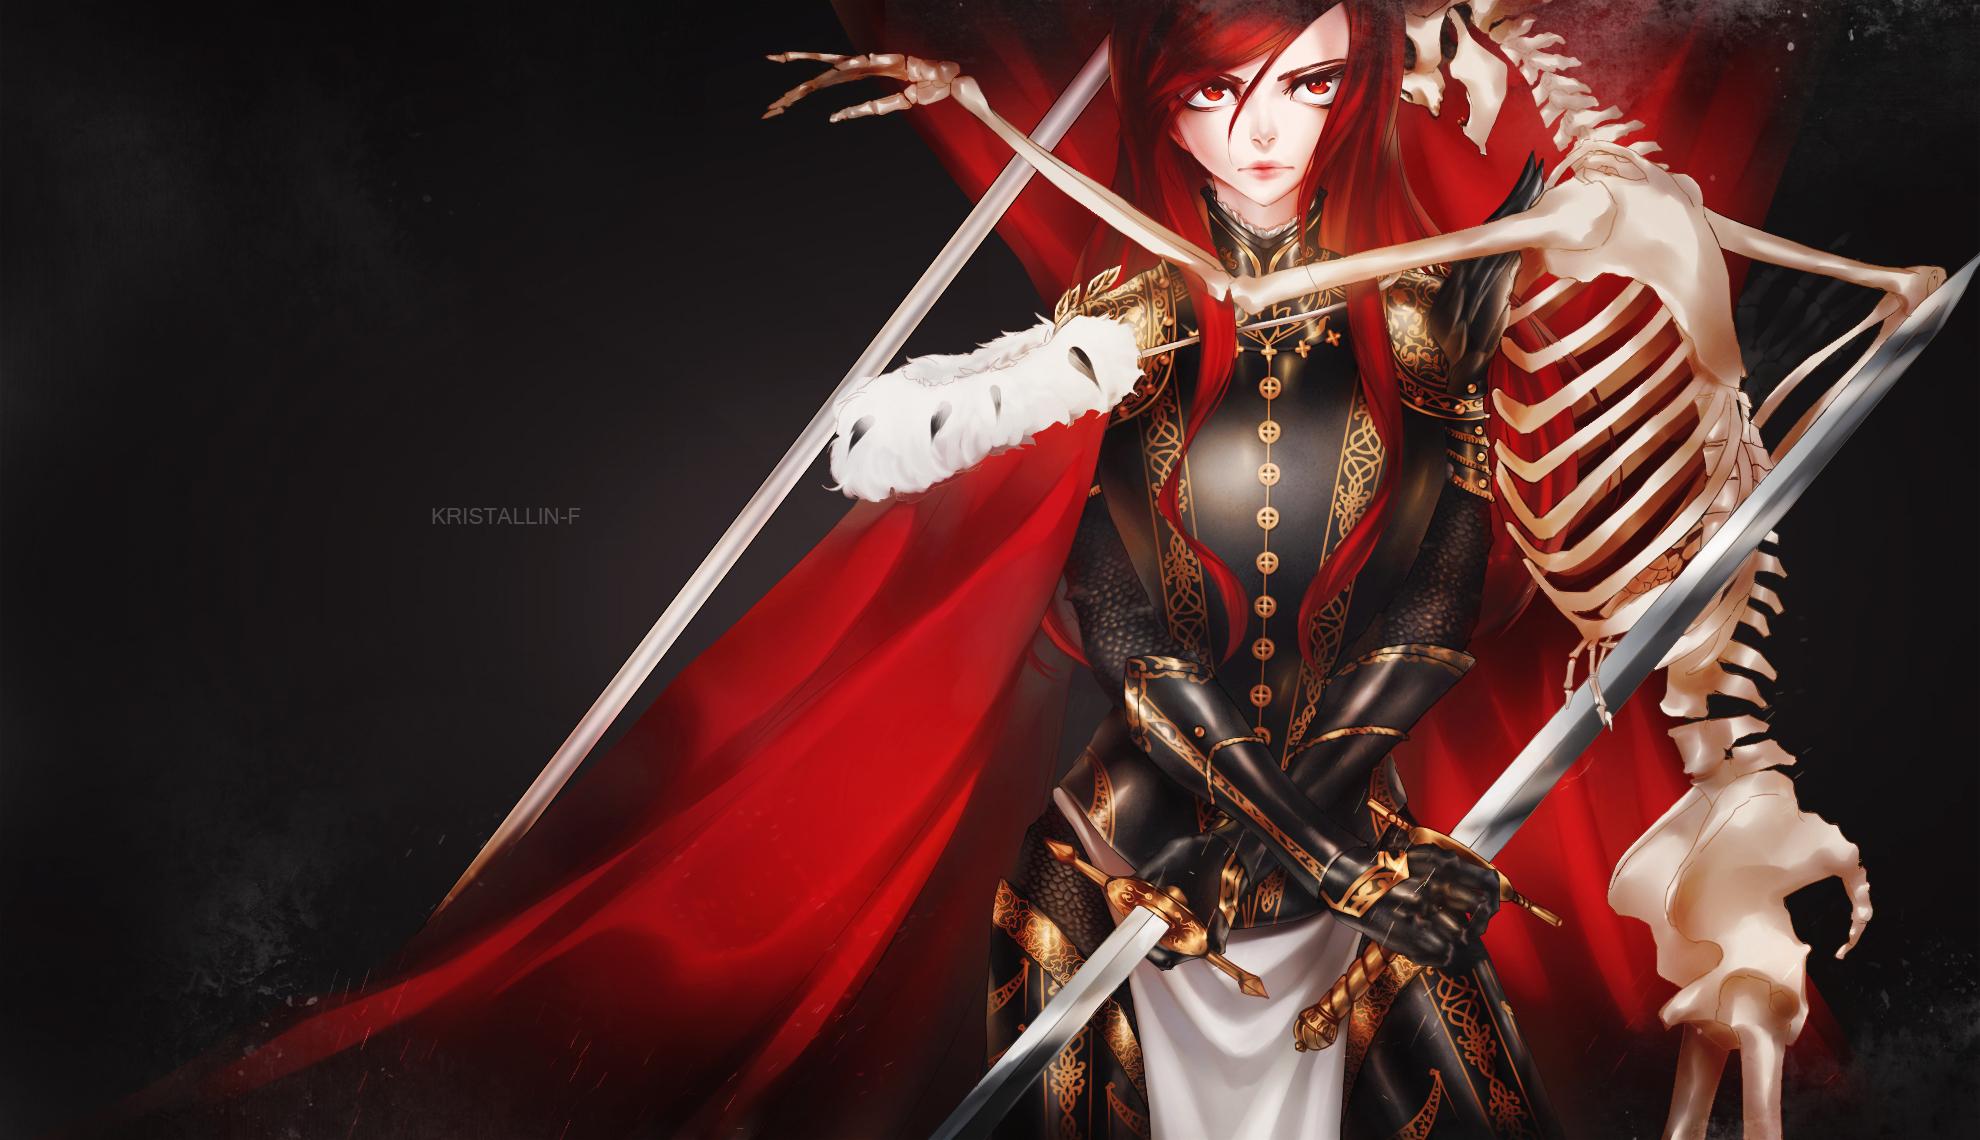 FT a warrior's heart by Kristallin-F